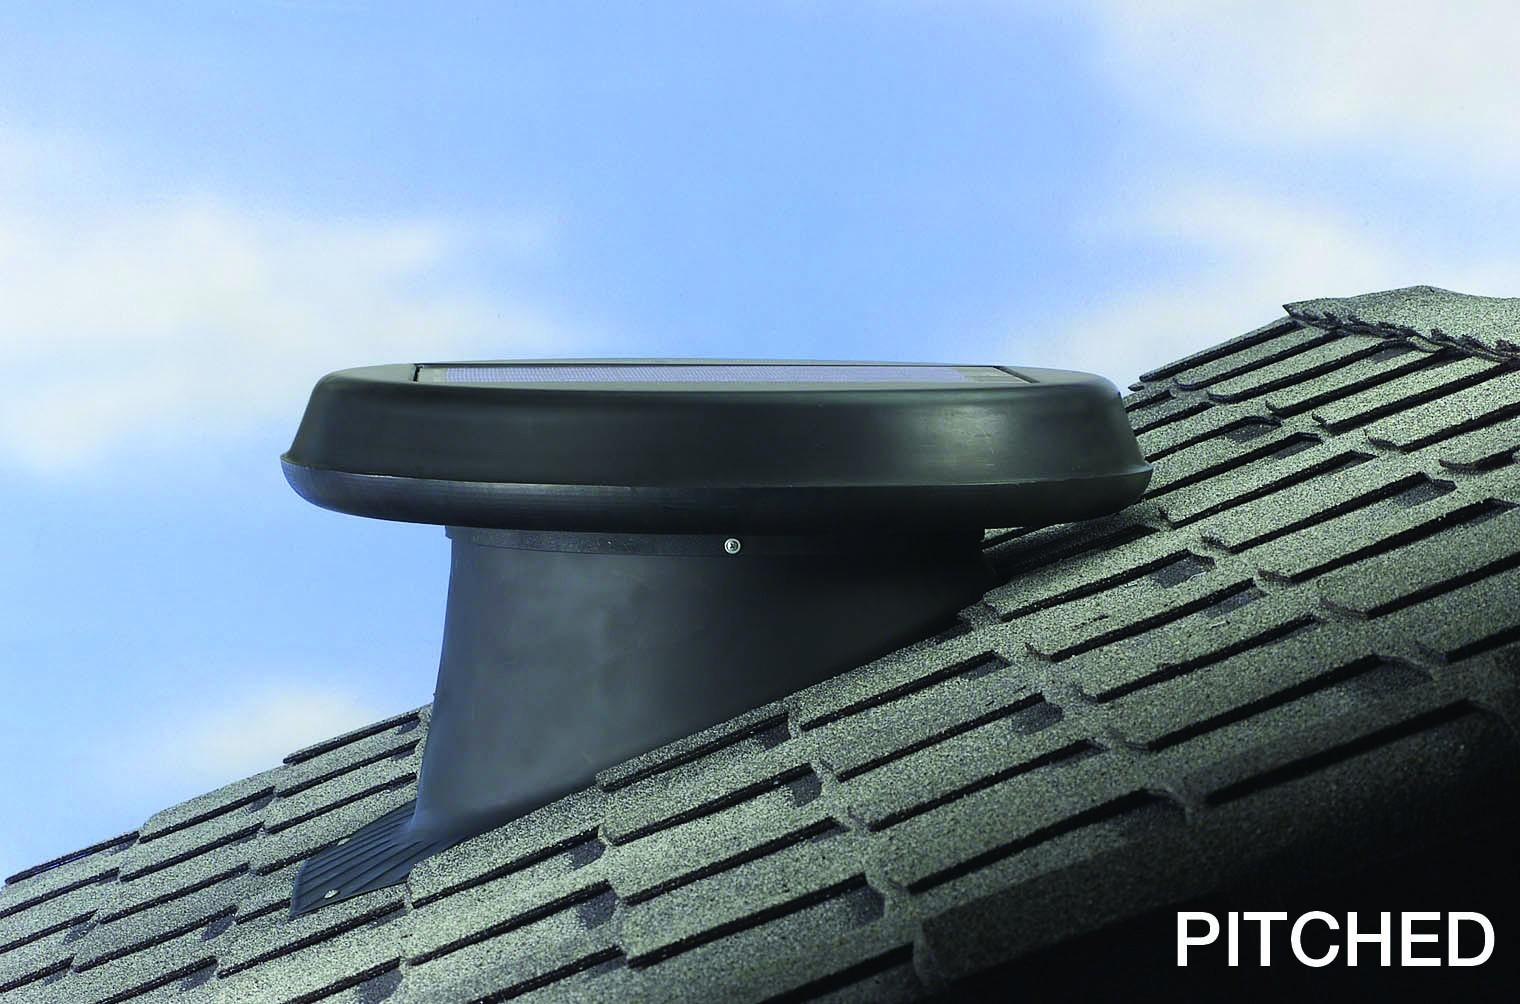 Solar star attic fan complaints - Solar Star Roof Attic Solar Fan Vent Pitched Model By Solatube Rm1200